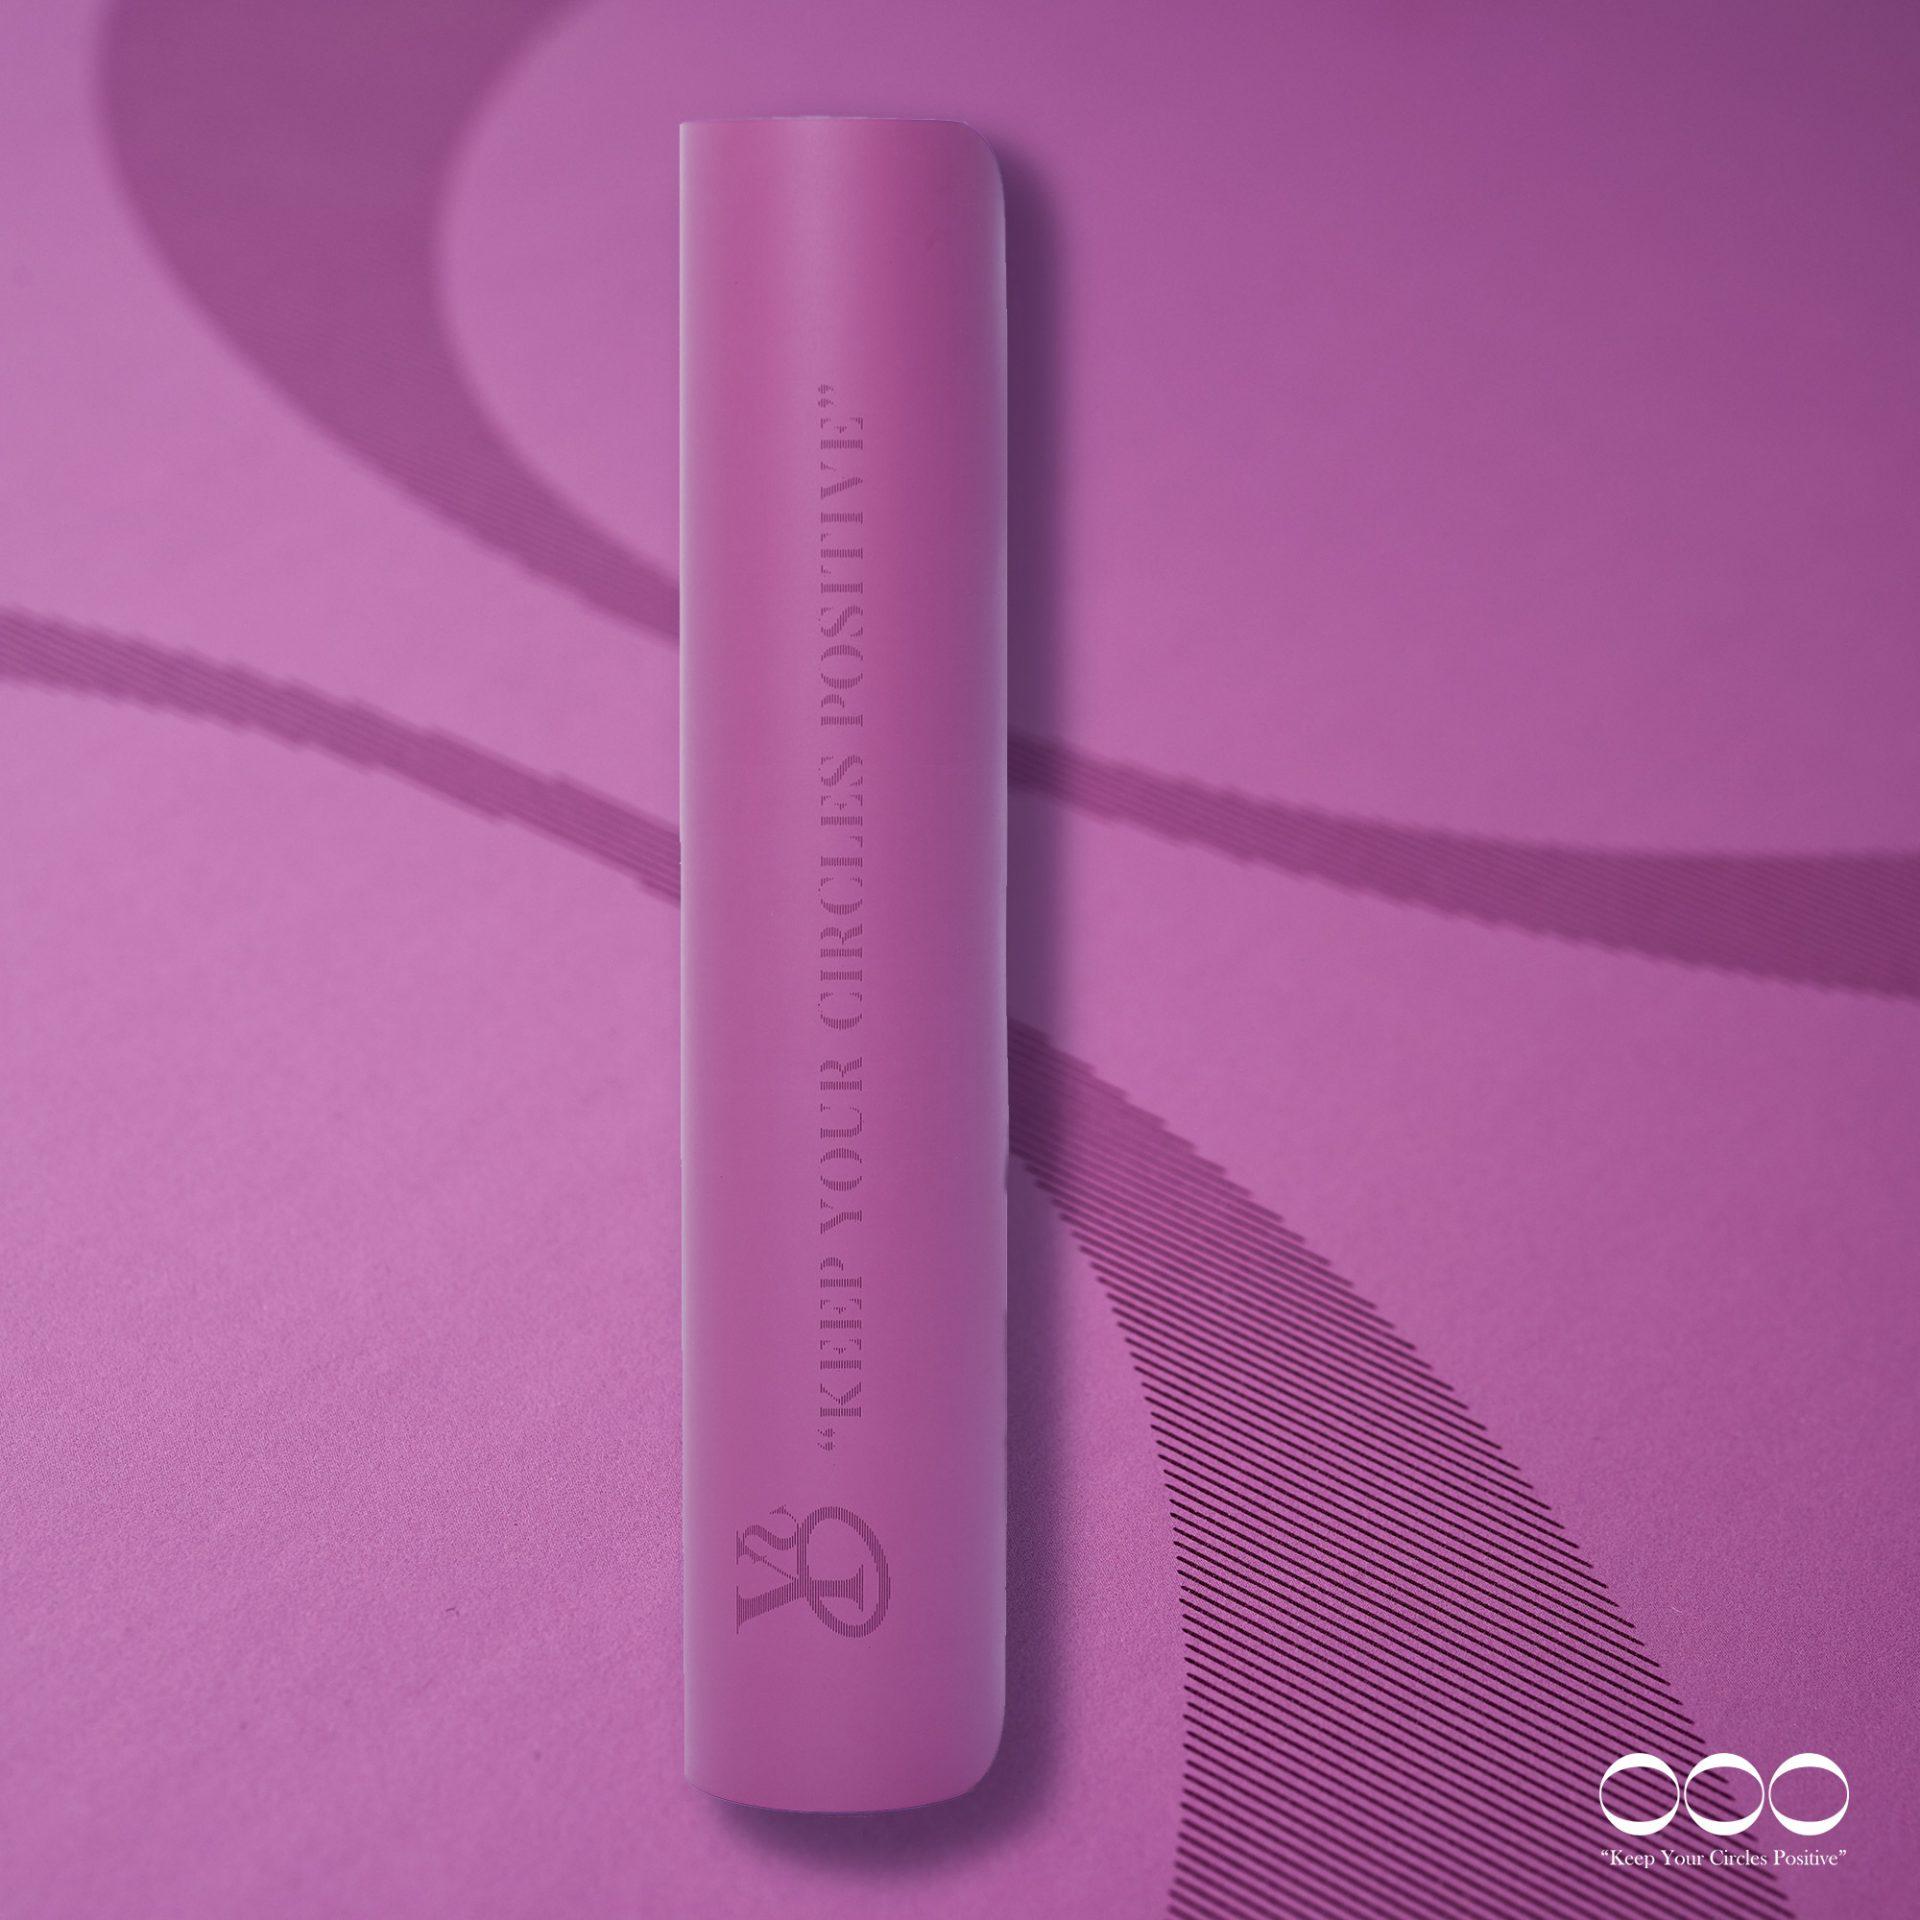 OOO-Dark-Purpler-stand-shadow-pic1-1-mat-background